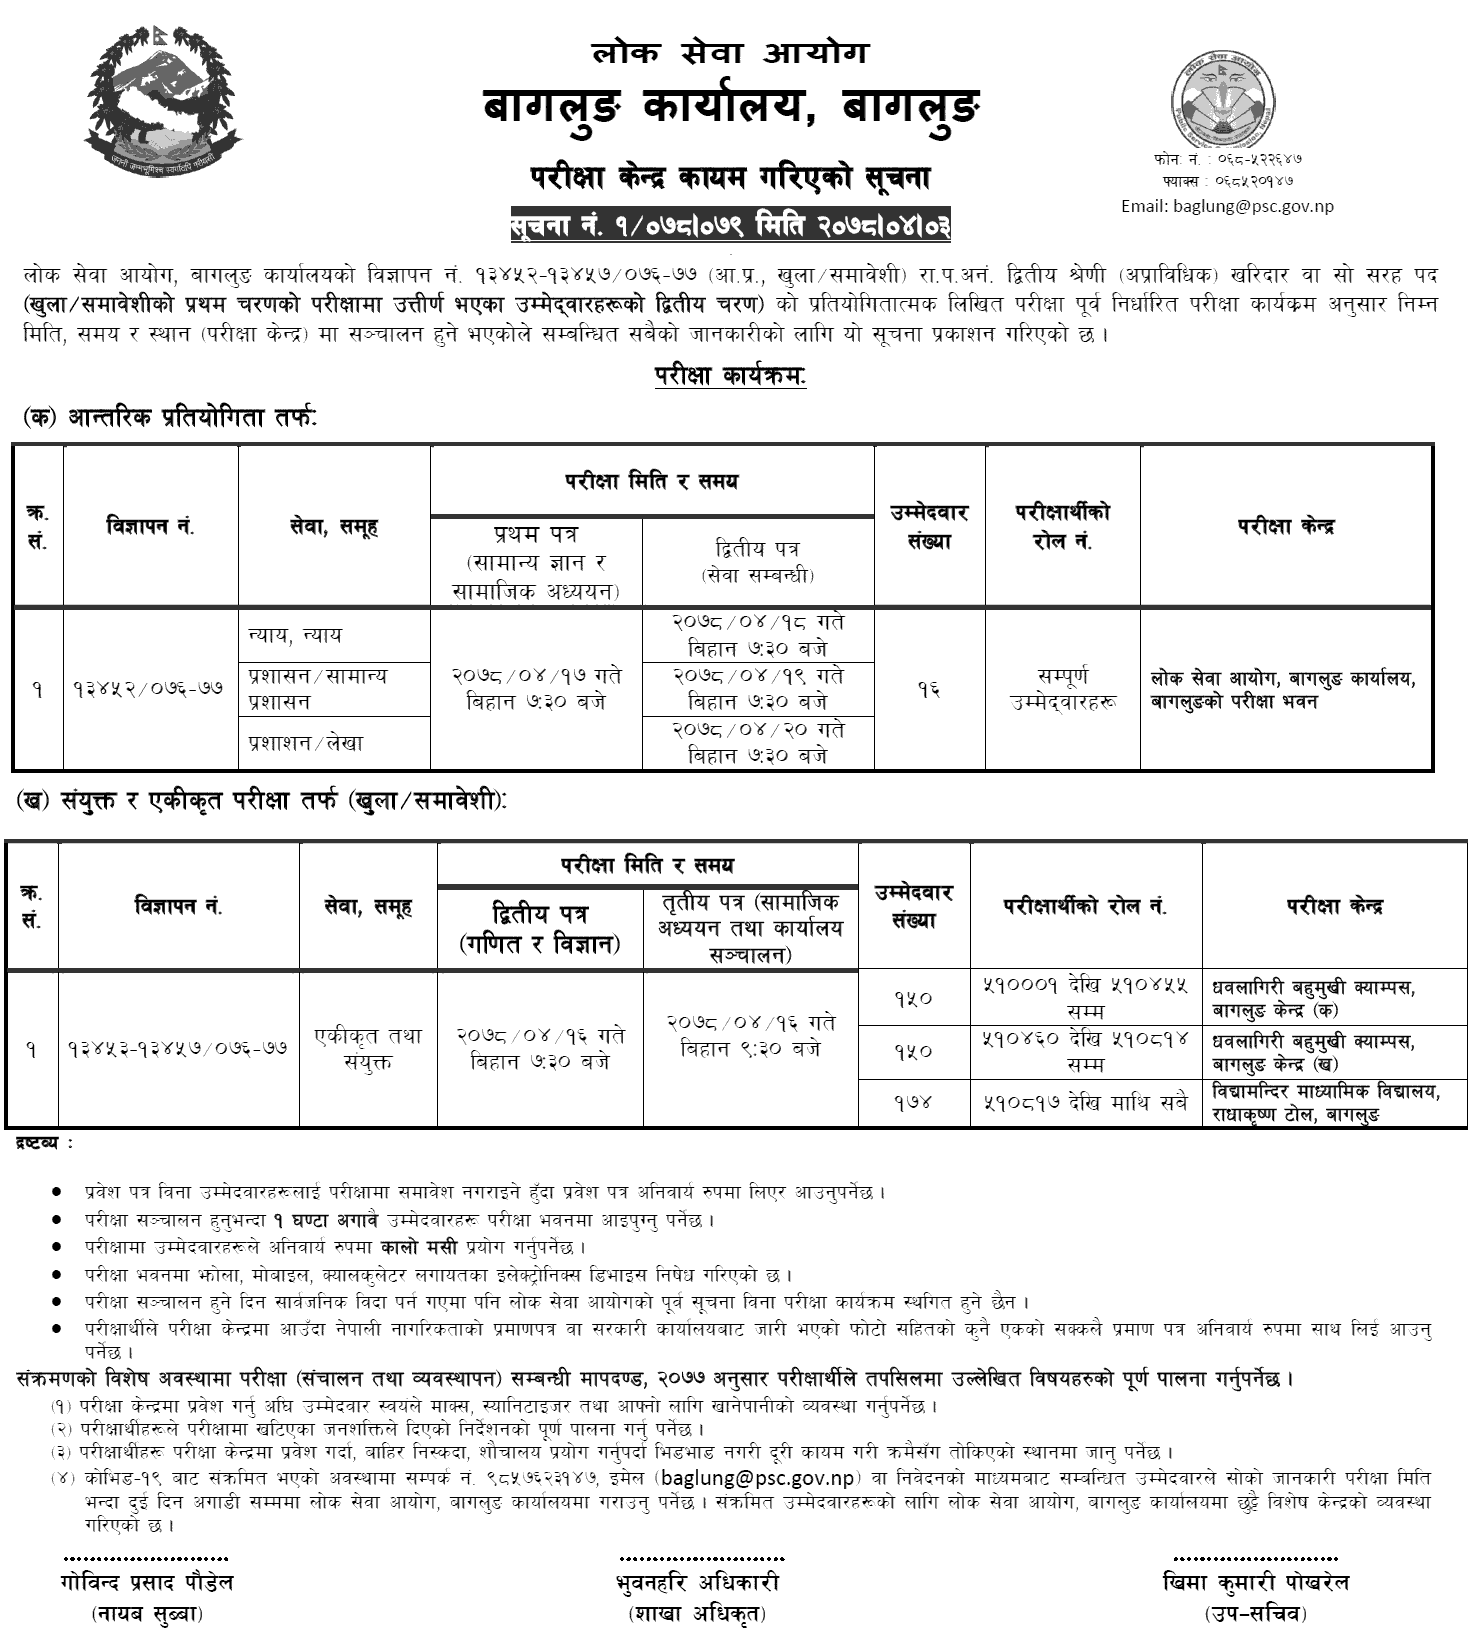 Lok-Sewa-Aayog-Baglung-Kharidar-Second-Phase-Written-Exam-Center